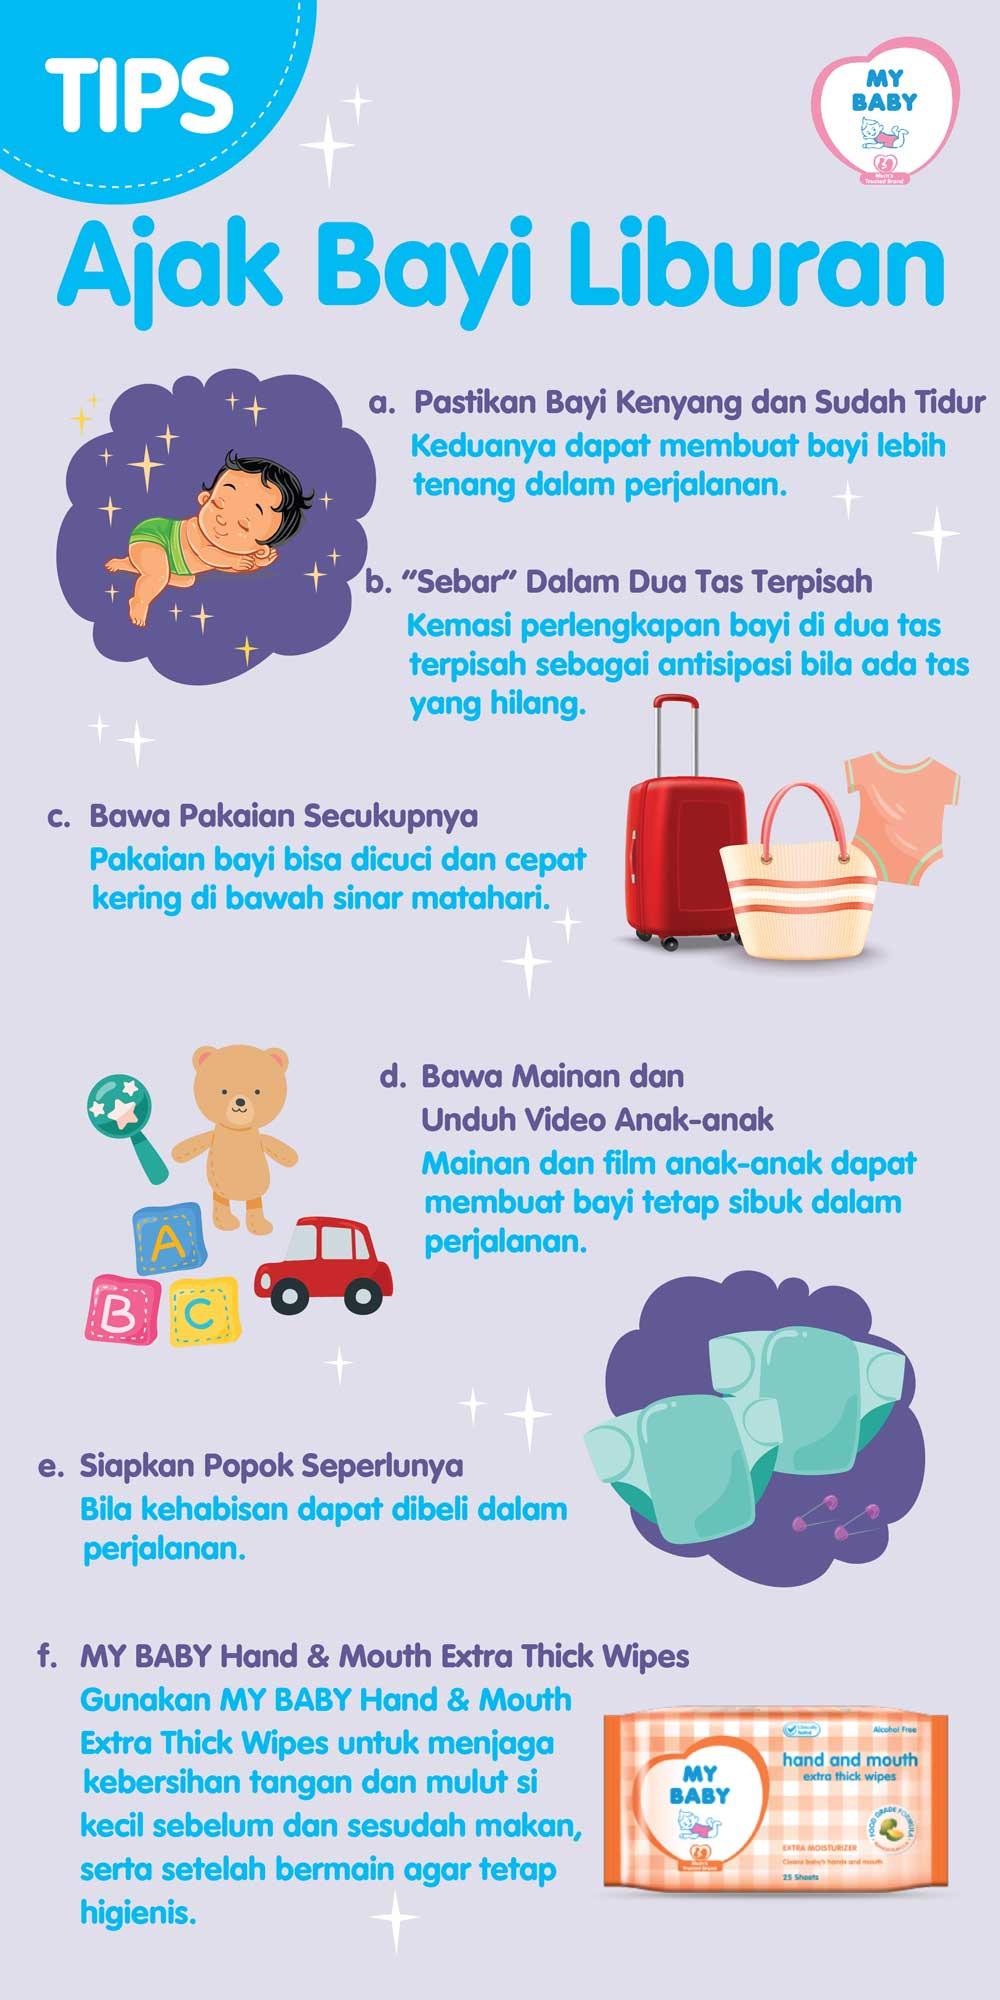 Tips Ajak Bayi Liburan